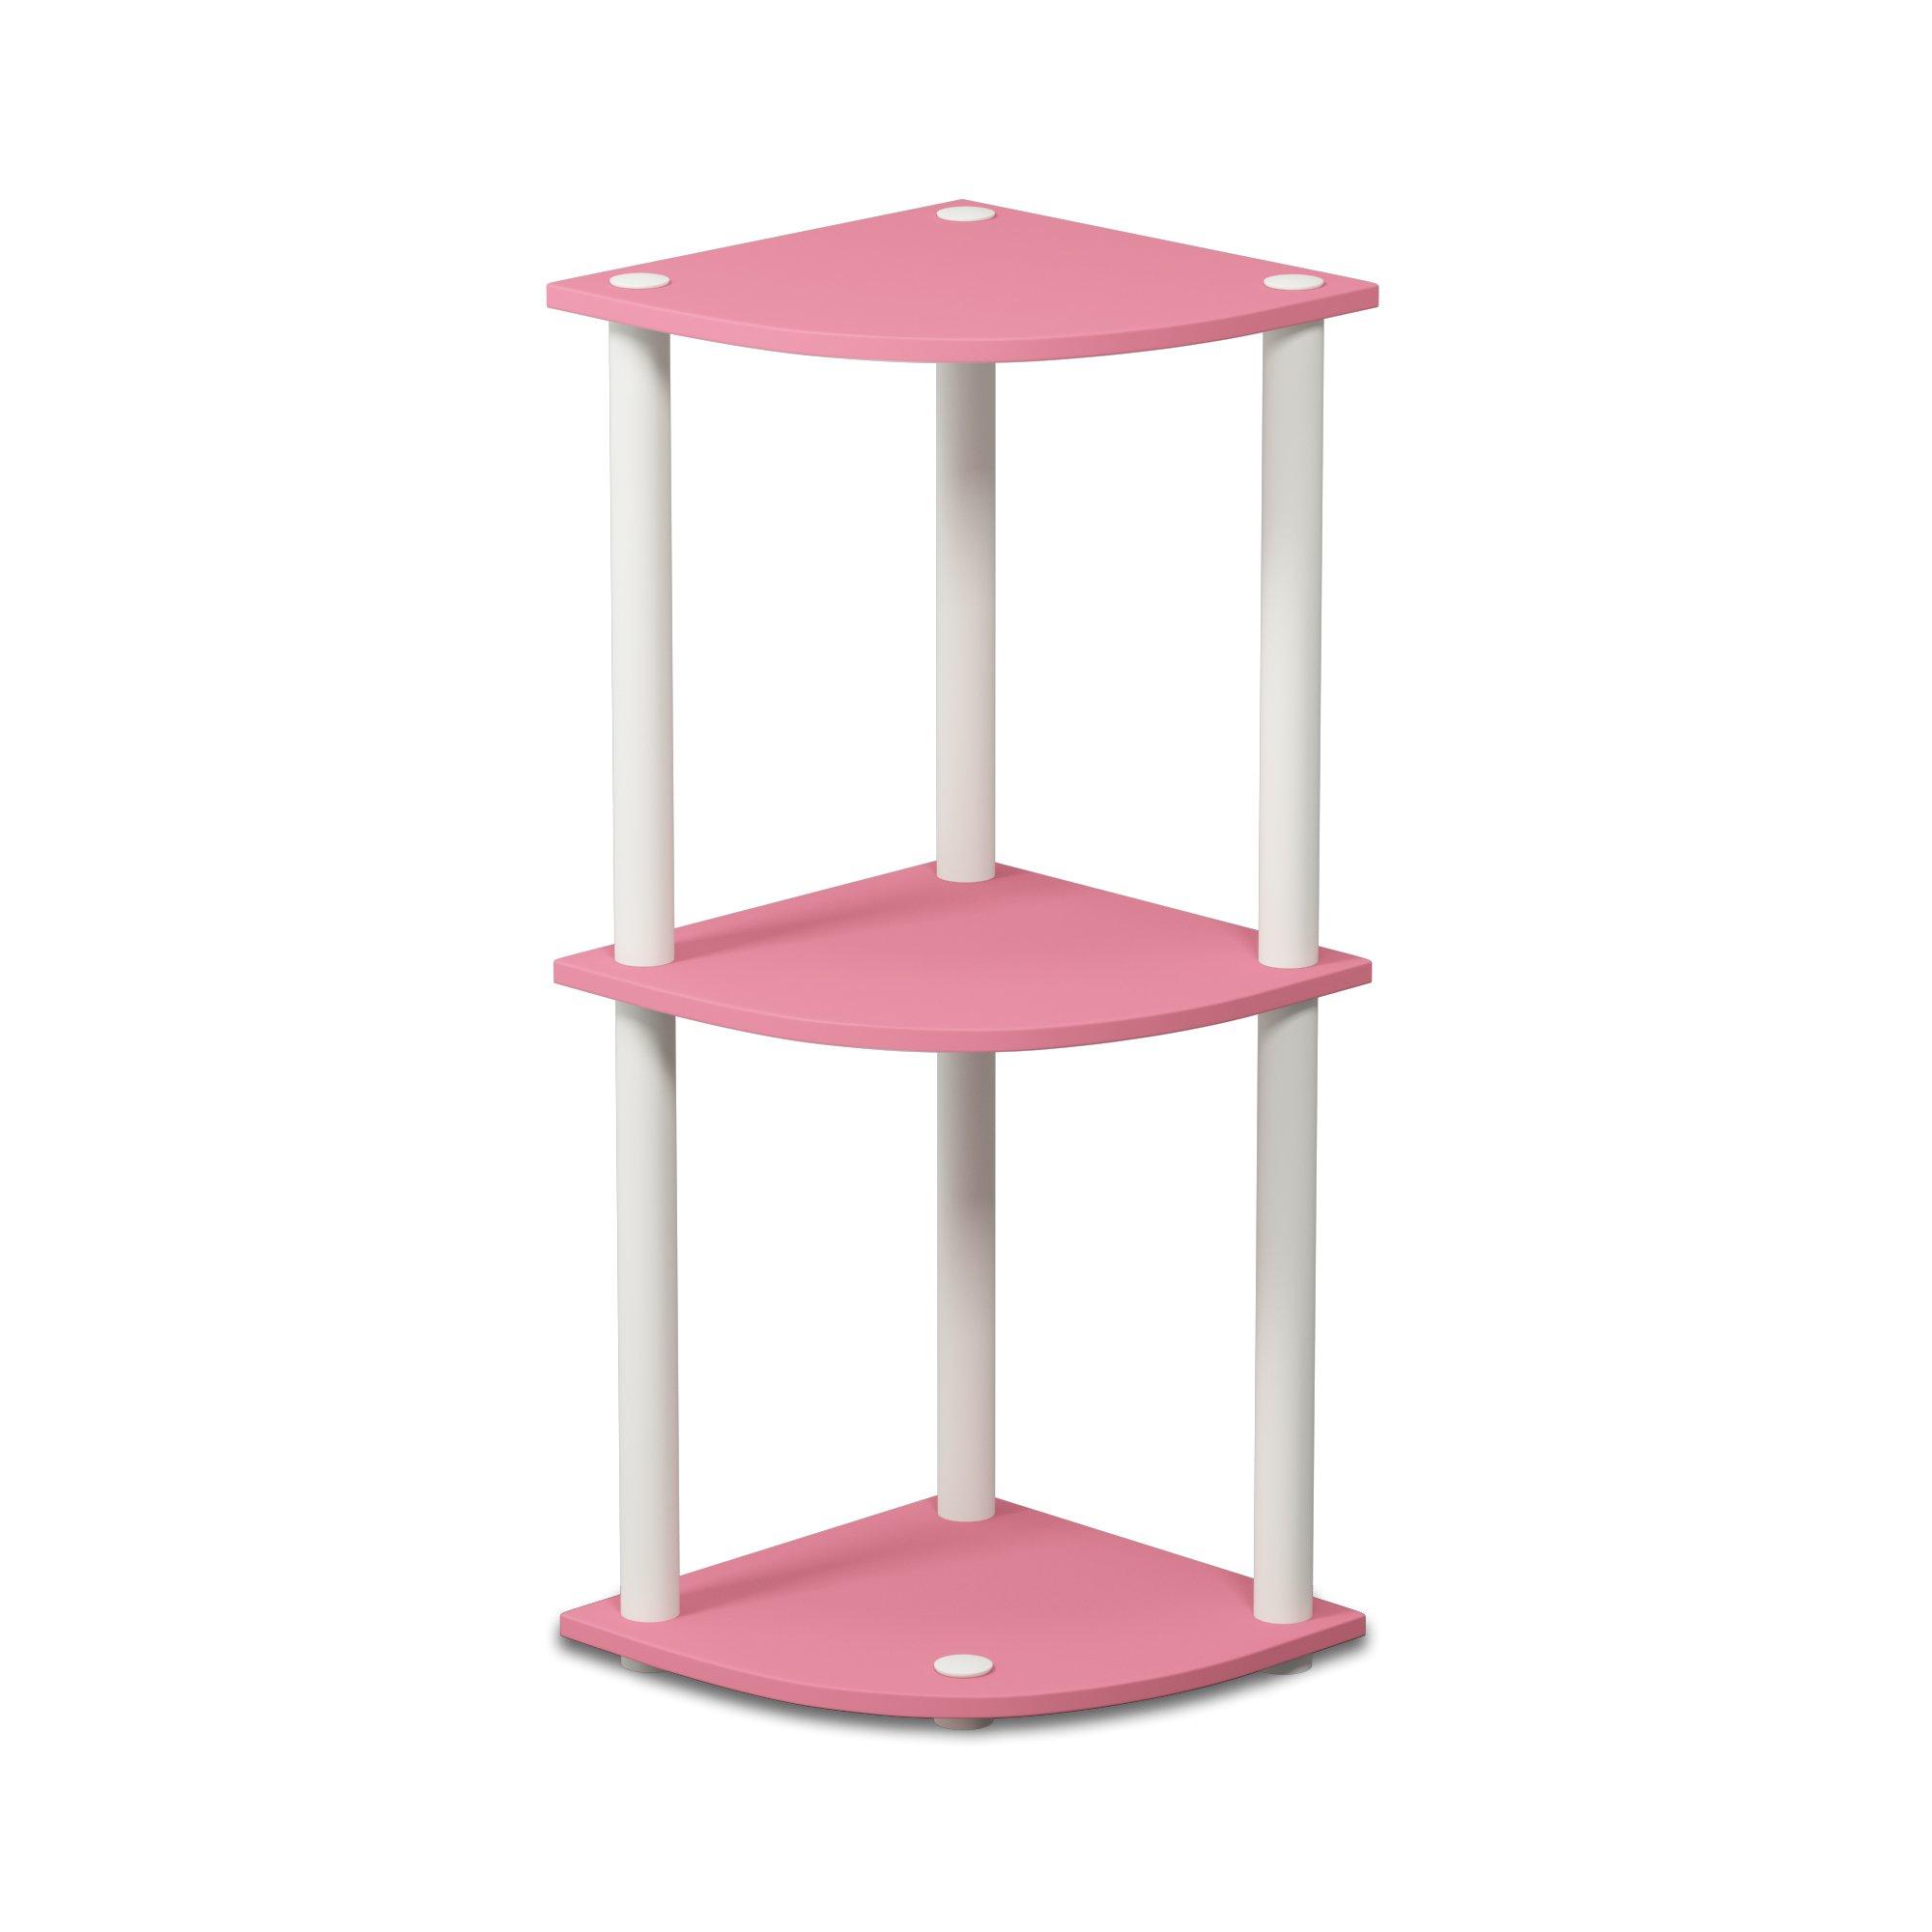 Furinno 12077PI/WH Turn-N-Tube 3-Tier Corner Reversible Multipurpose Shelf, Round, Pink/White